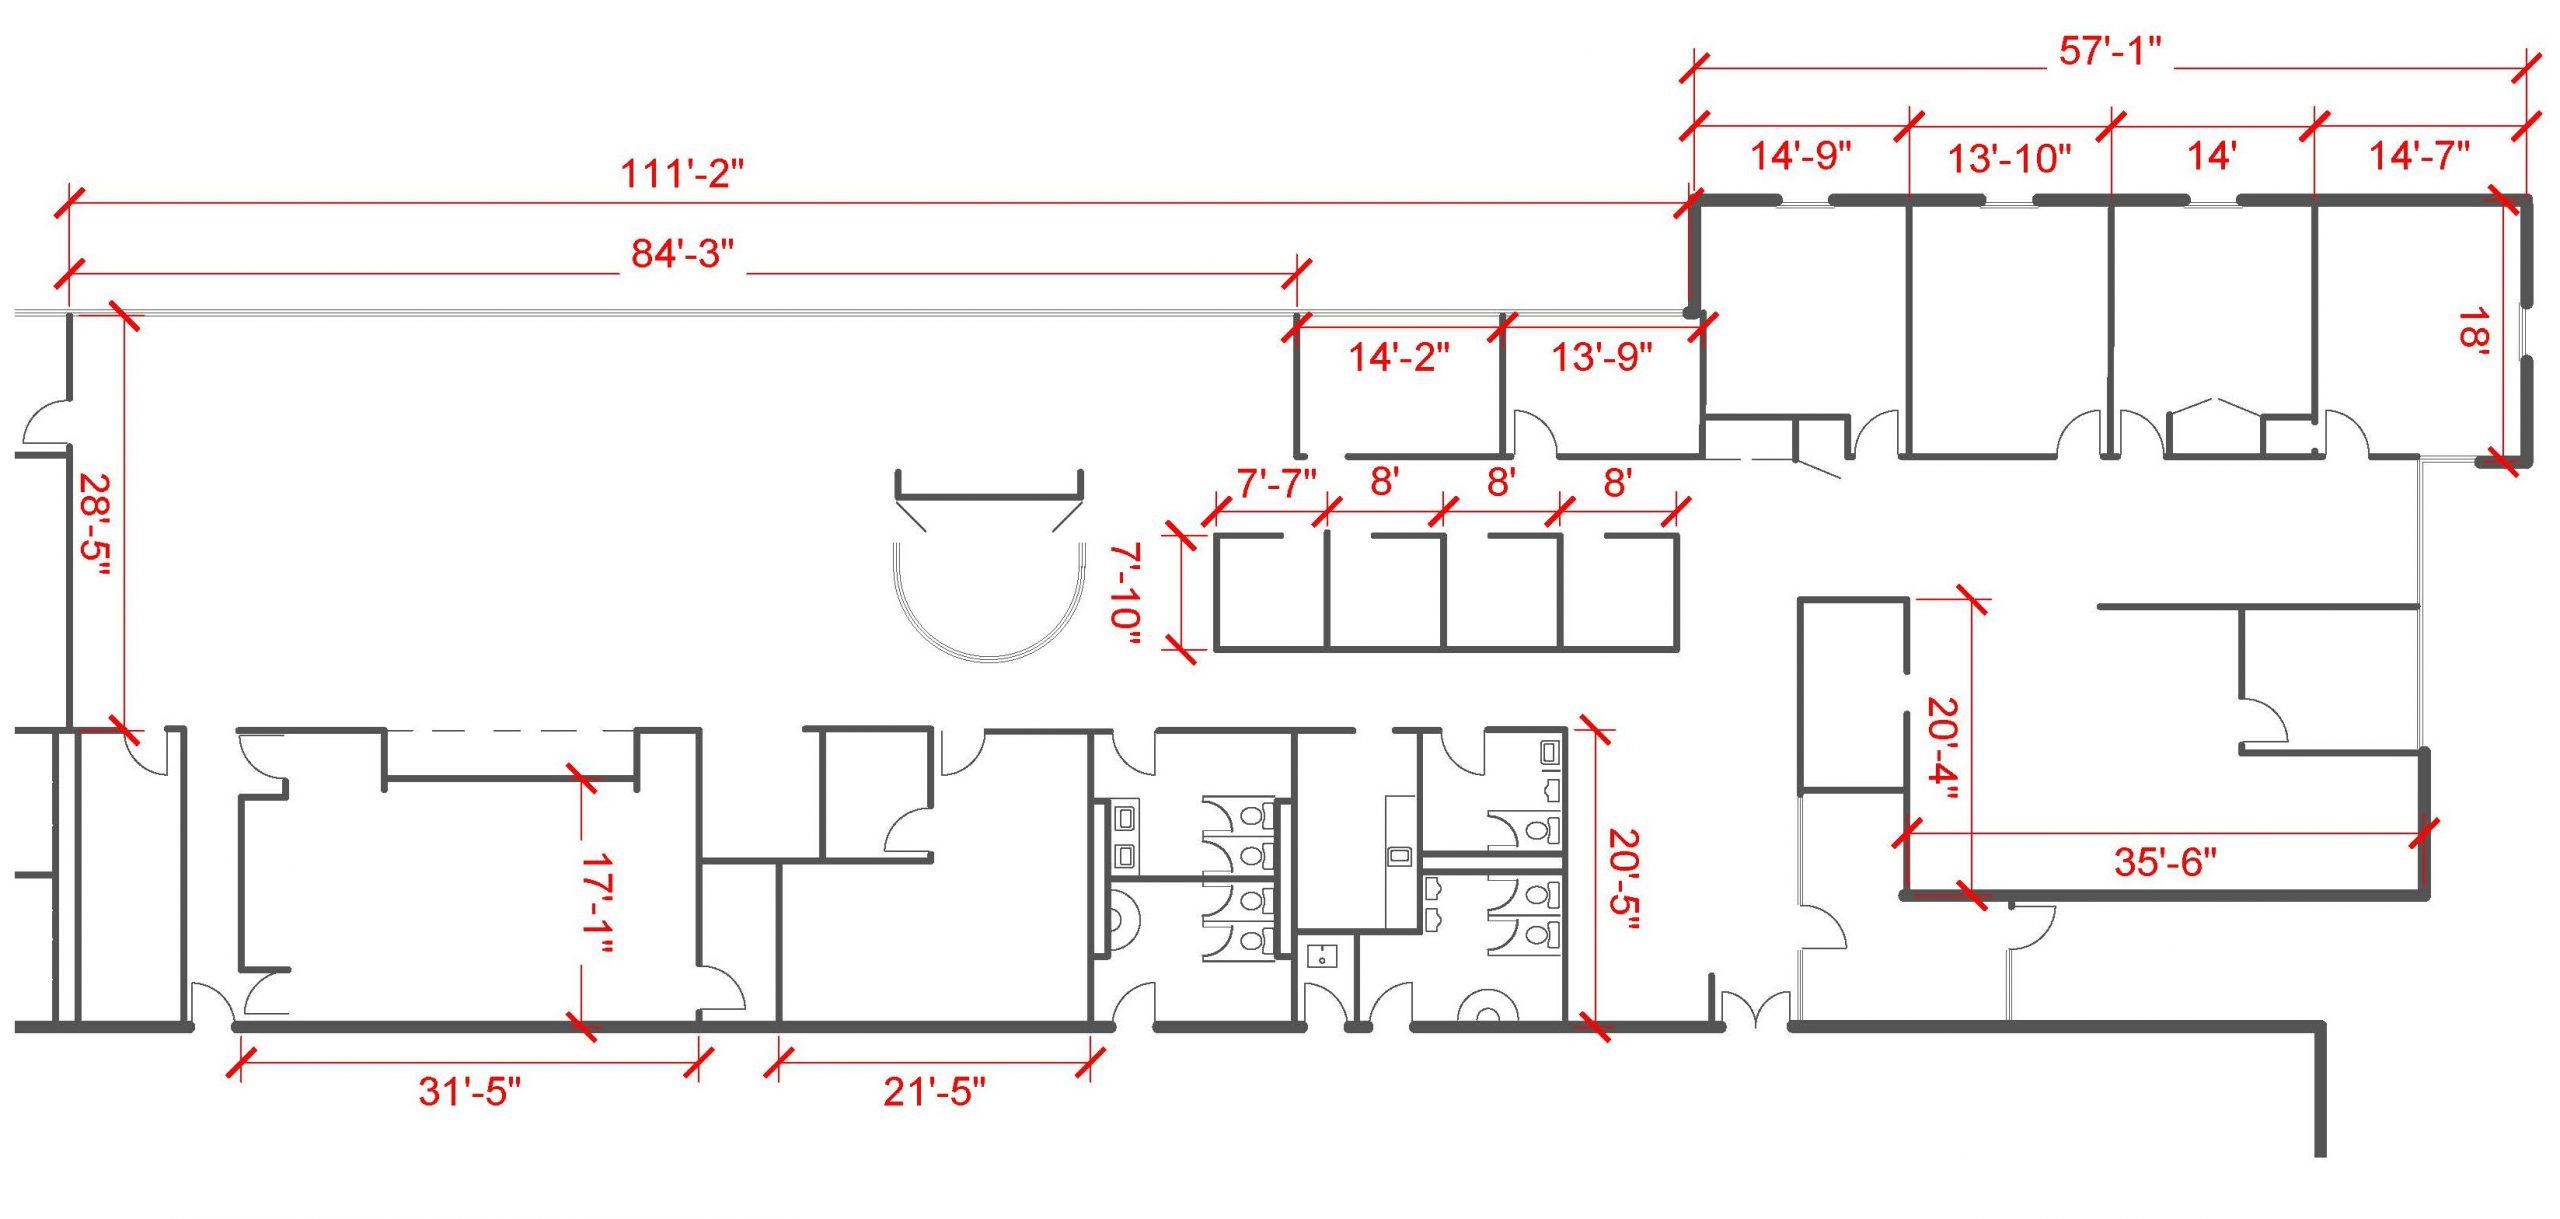 https://www.teamweston.com/wp-content/uploads/2020/05/8400-Darrow-Floor-Plan-in-JPEG-scaled.jpg